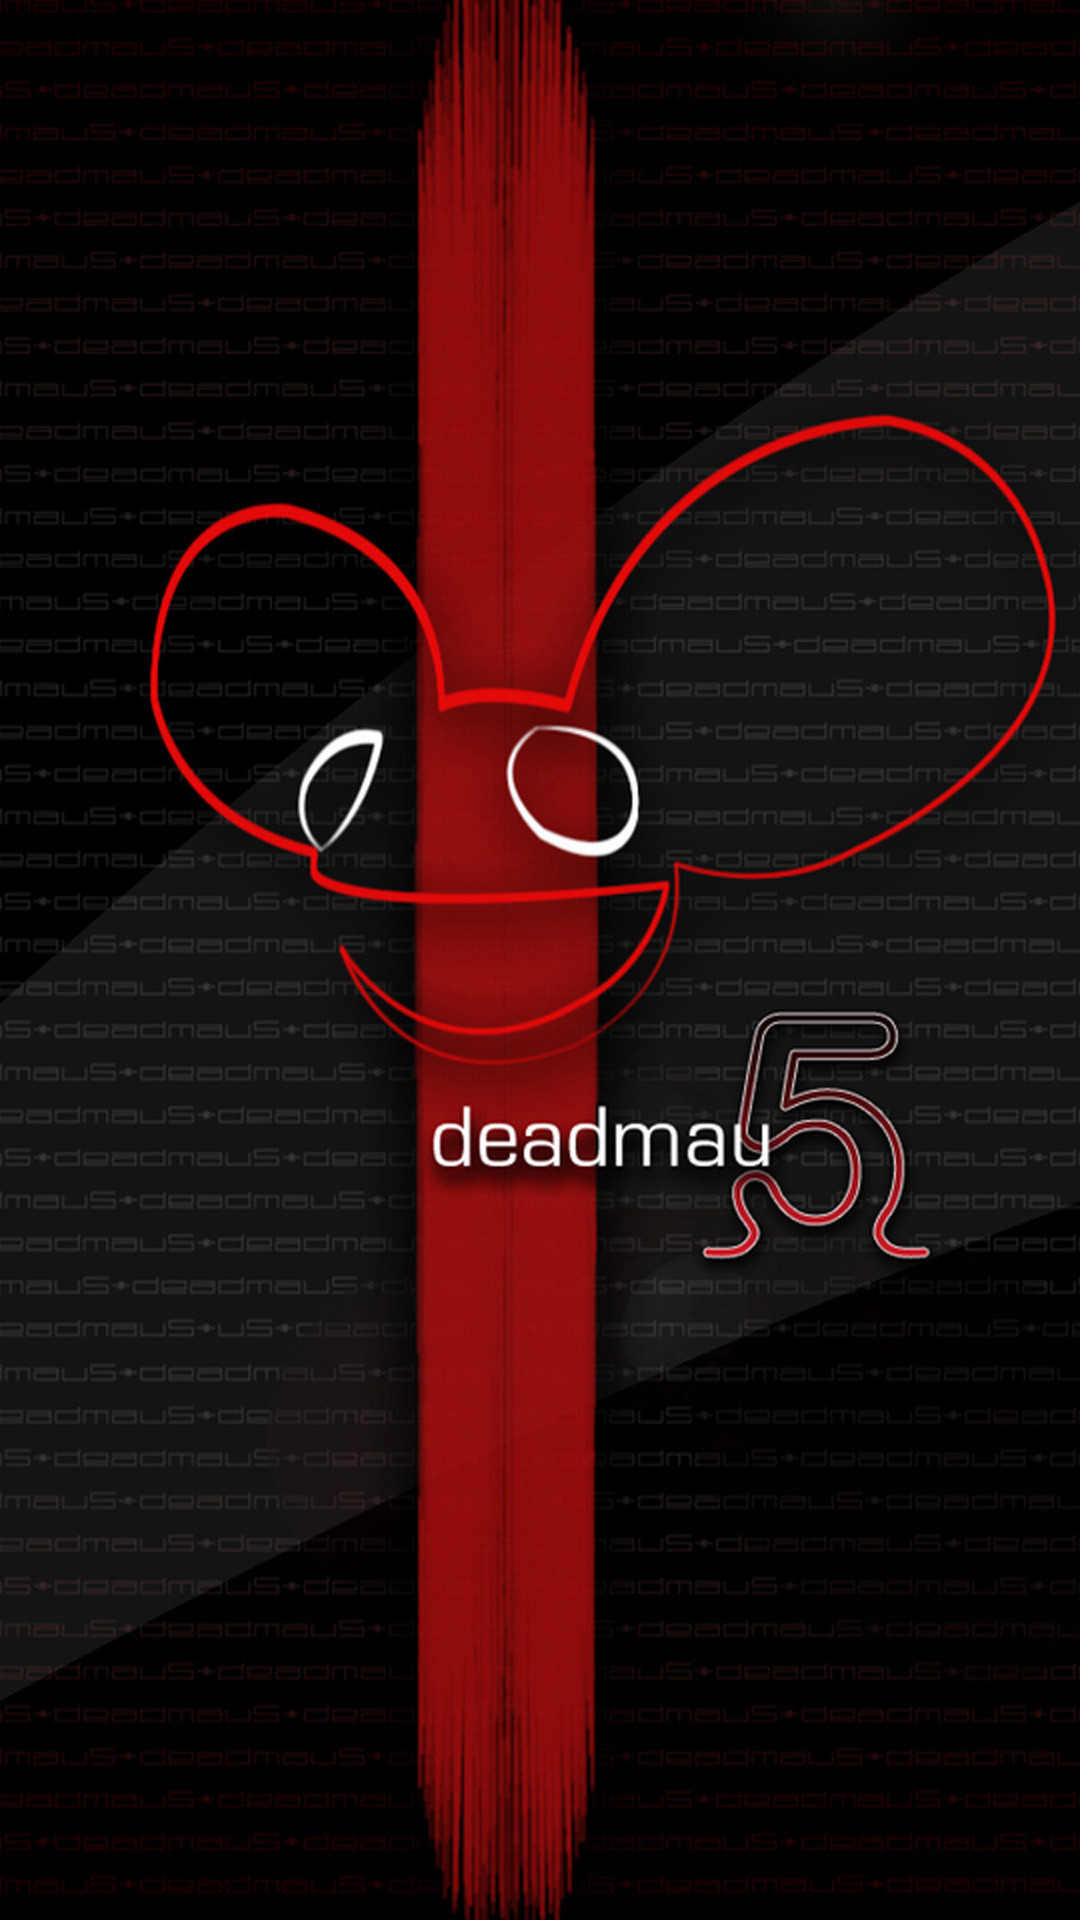 Deadmau5 Red Stripe HD Wallpaper iPhone 6 plus